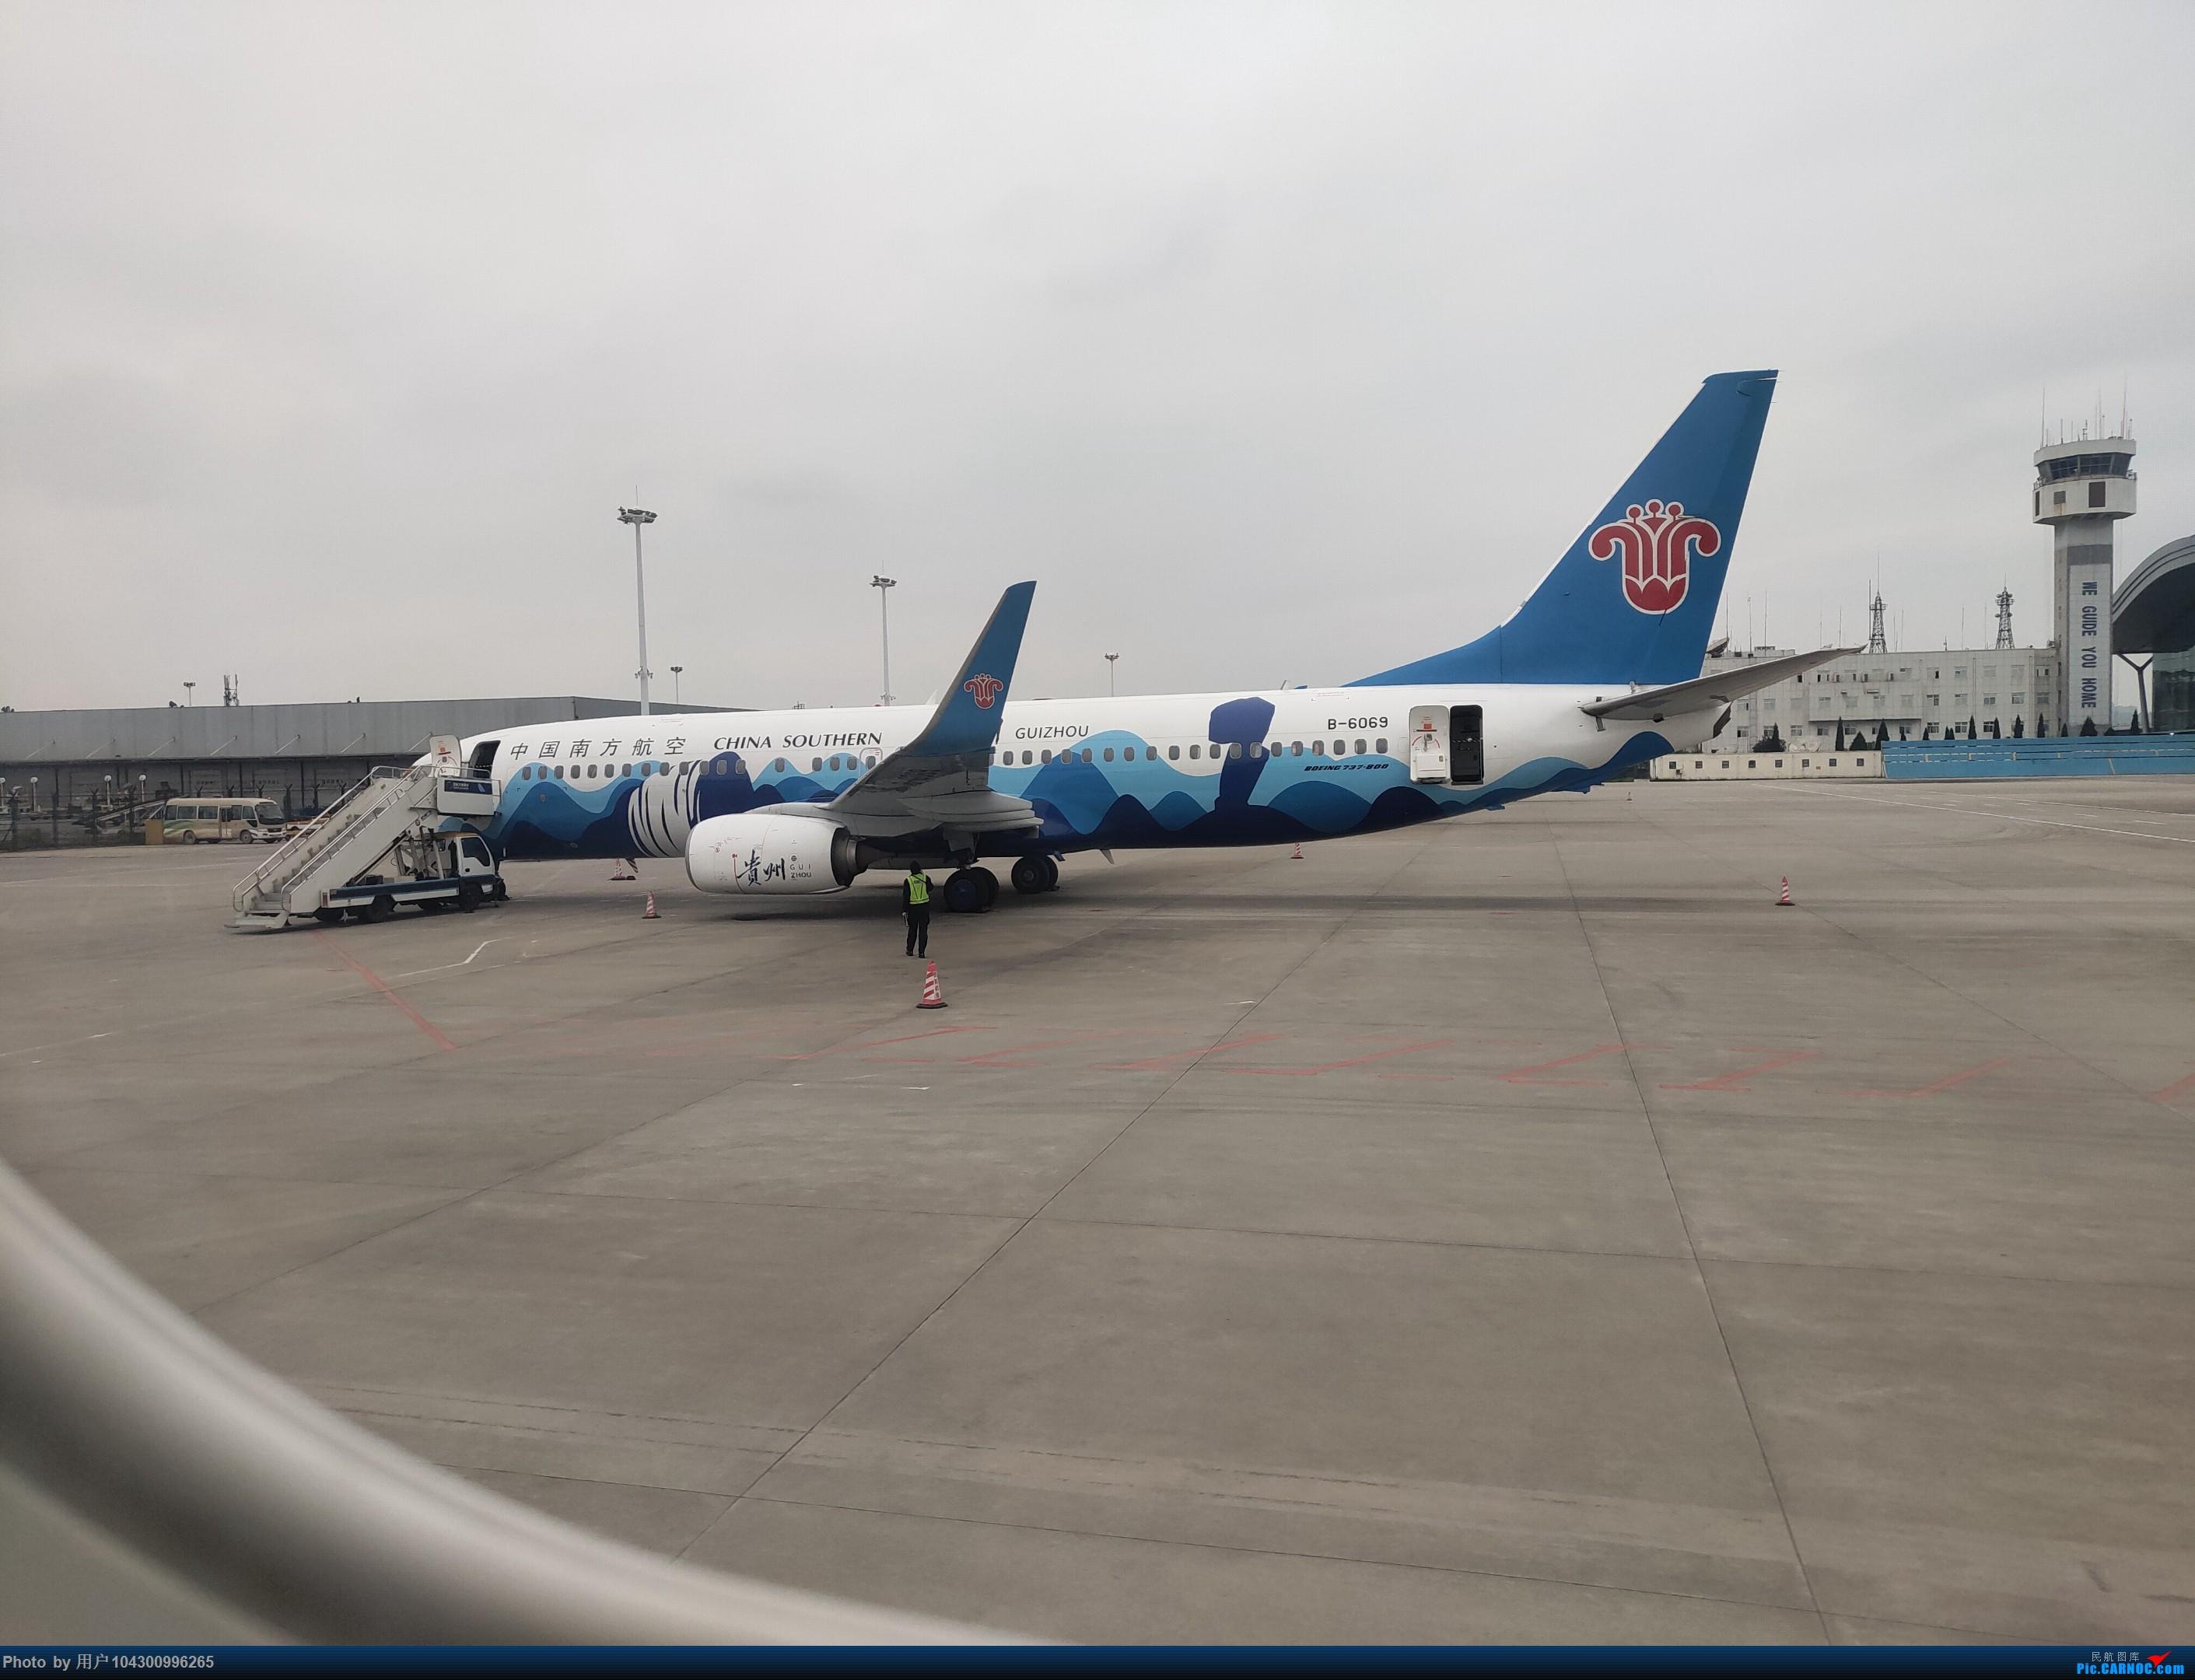 Re:[原创]DM游记之GY贵阳-成都往返(参观空港花田) BOEING 737-800 B-6069 中国贵阳龙洞堡国际机场